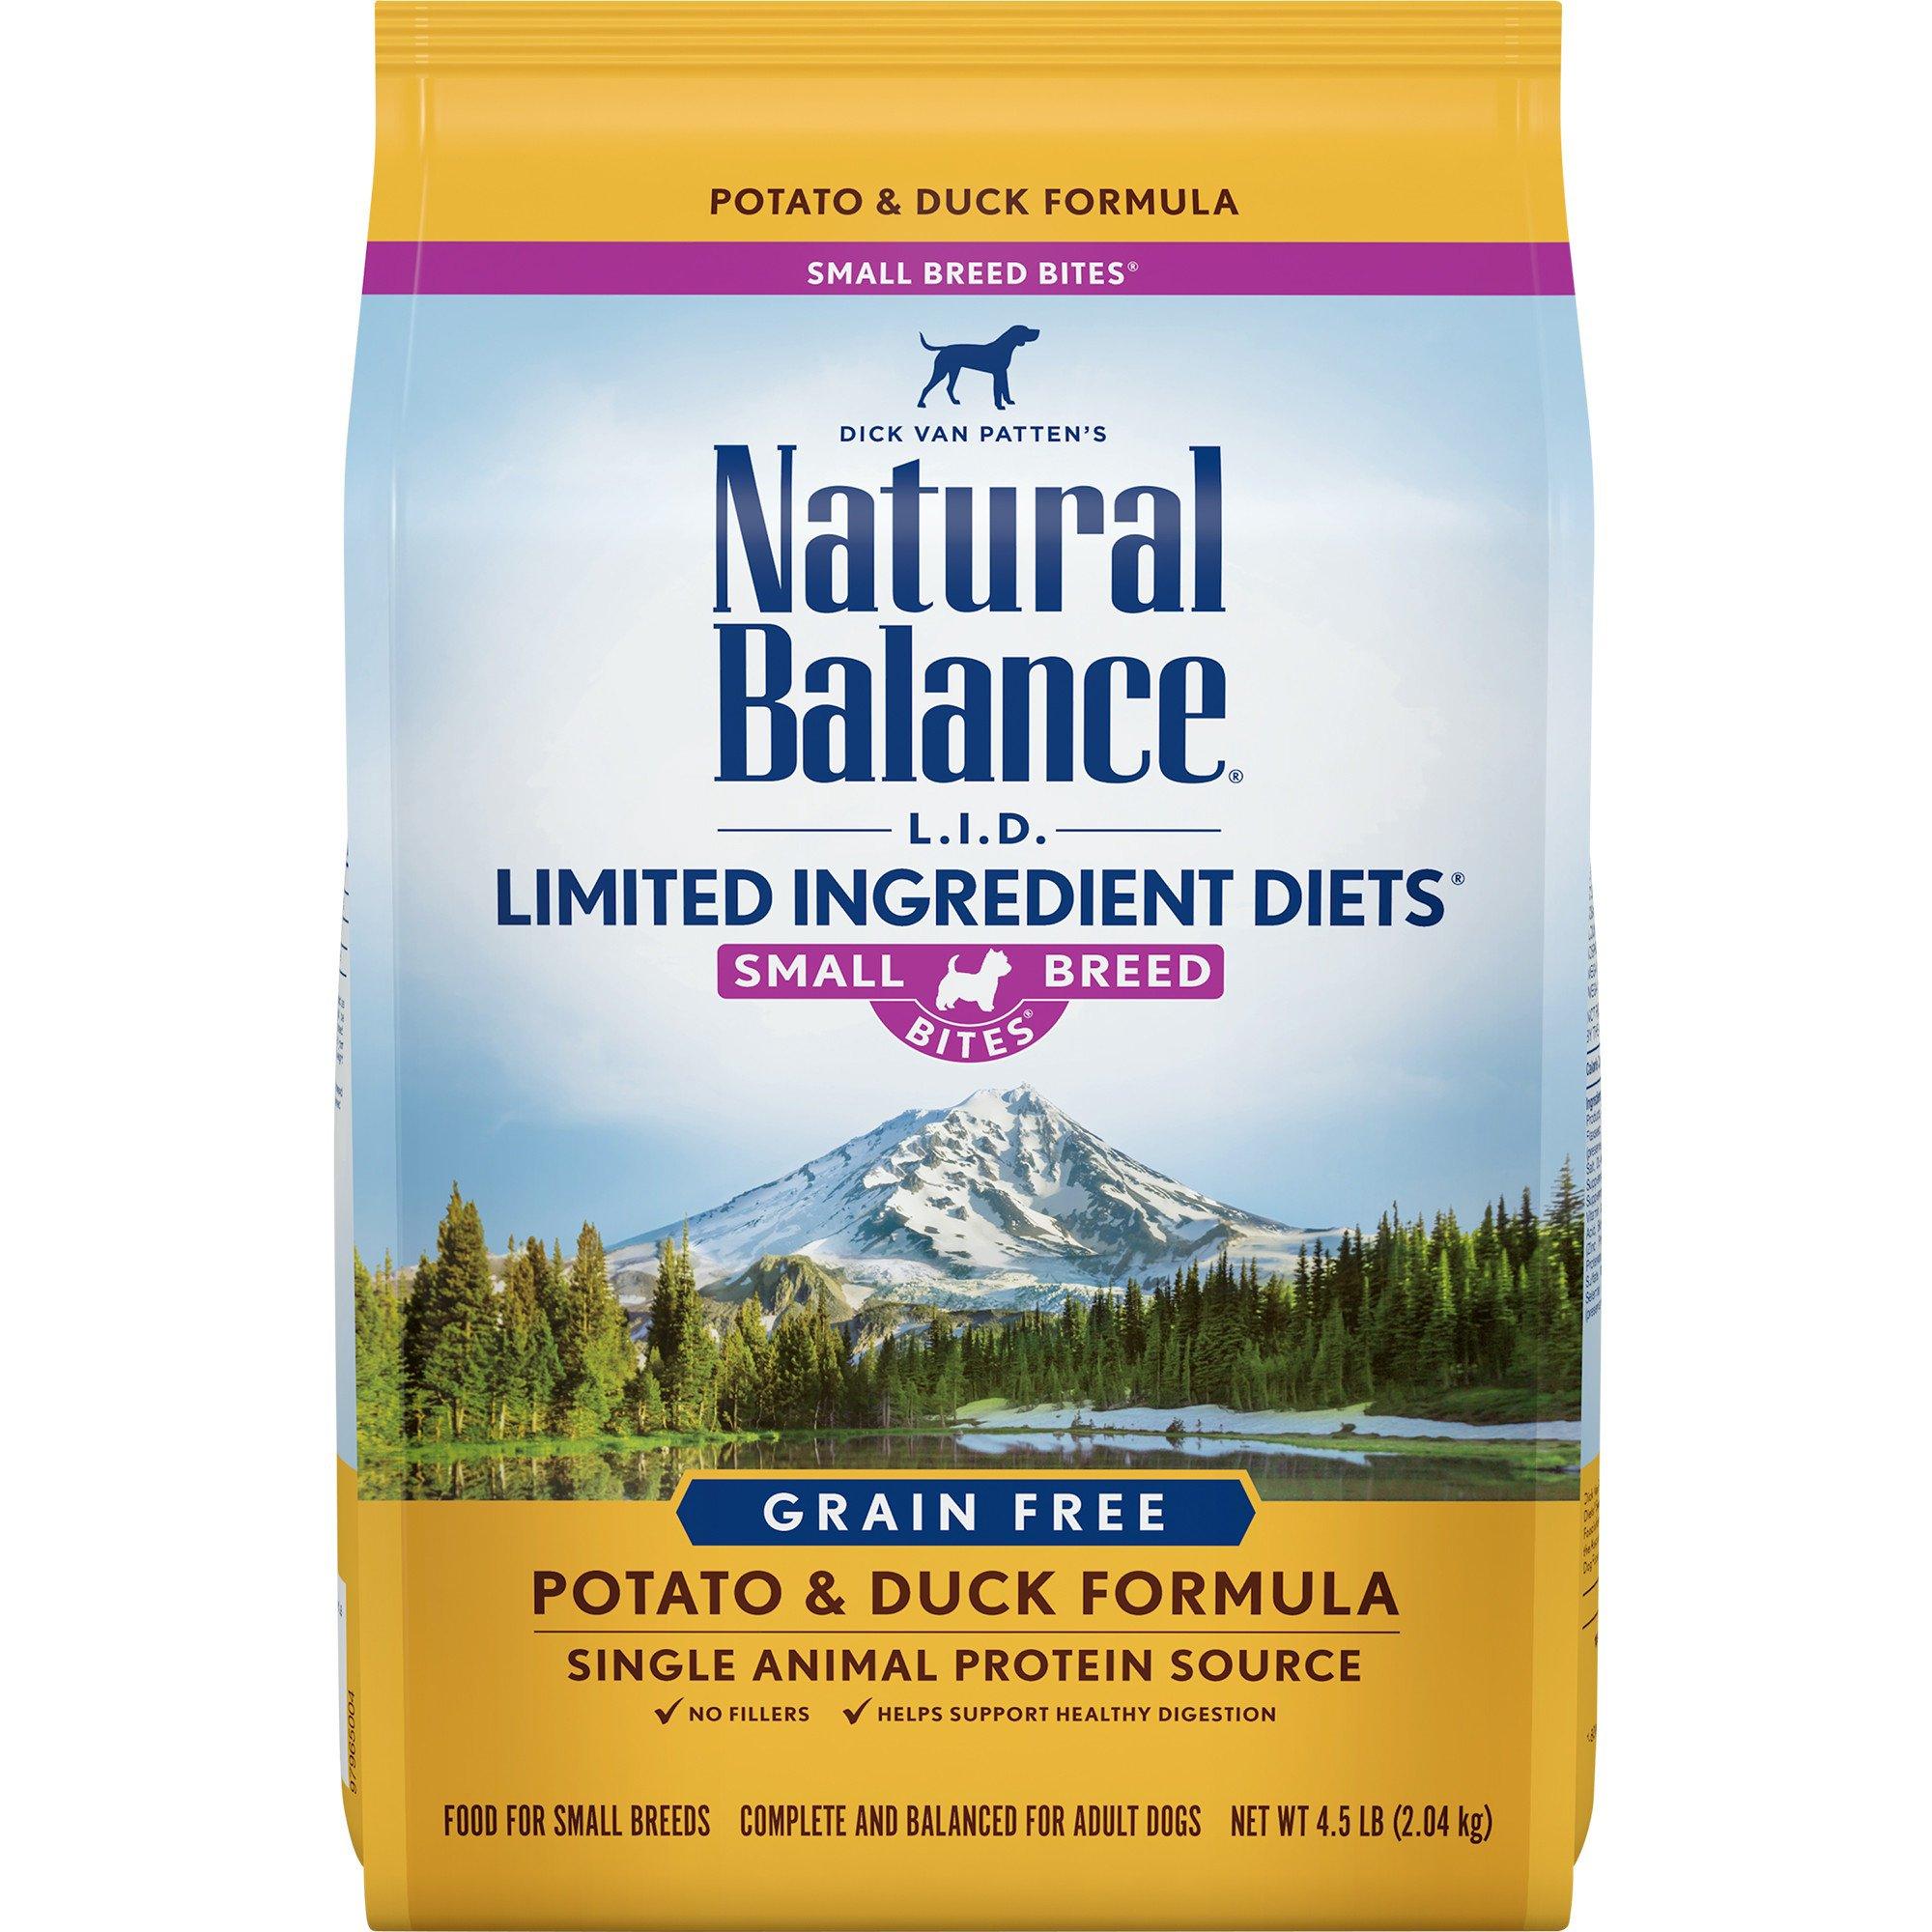 Natural Balance Small Bites Potato & Duck Formula Dog Food